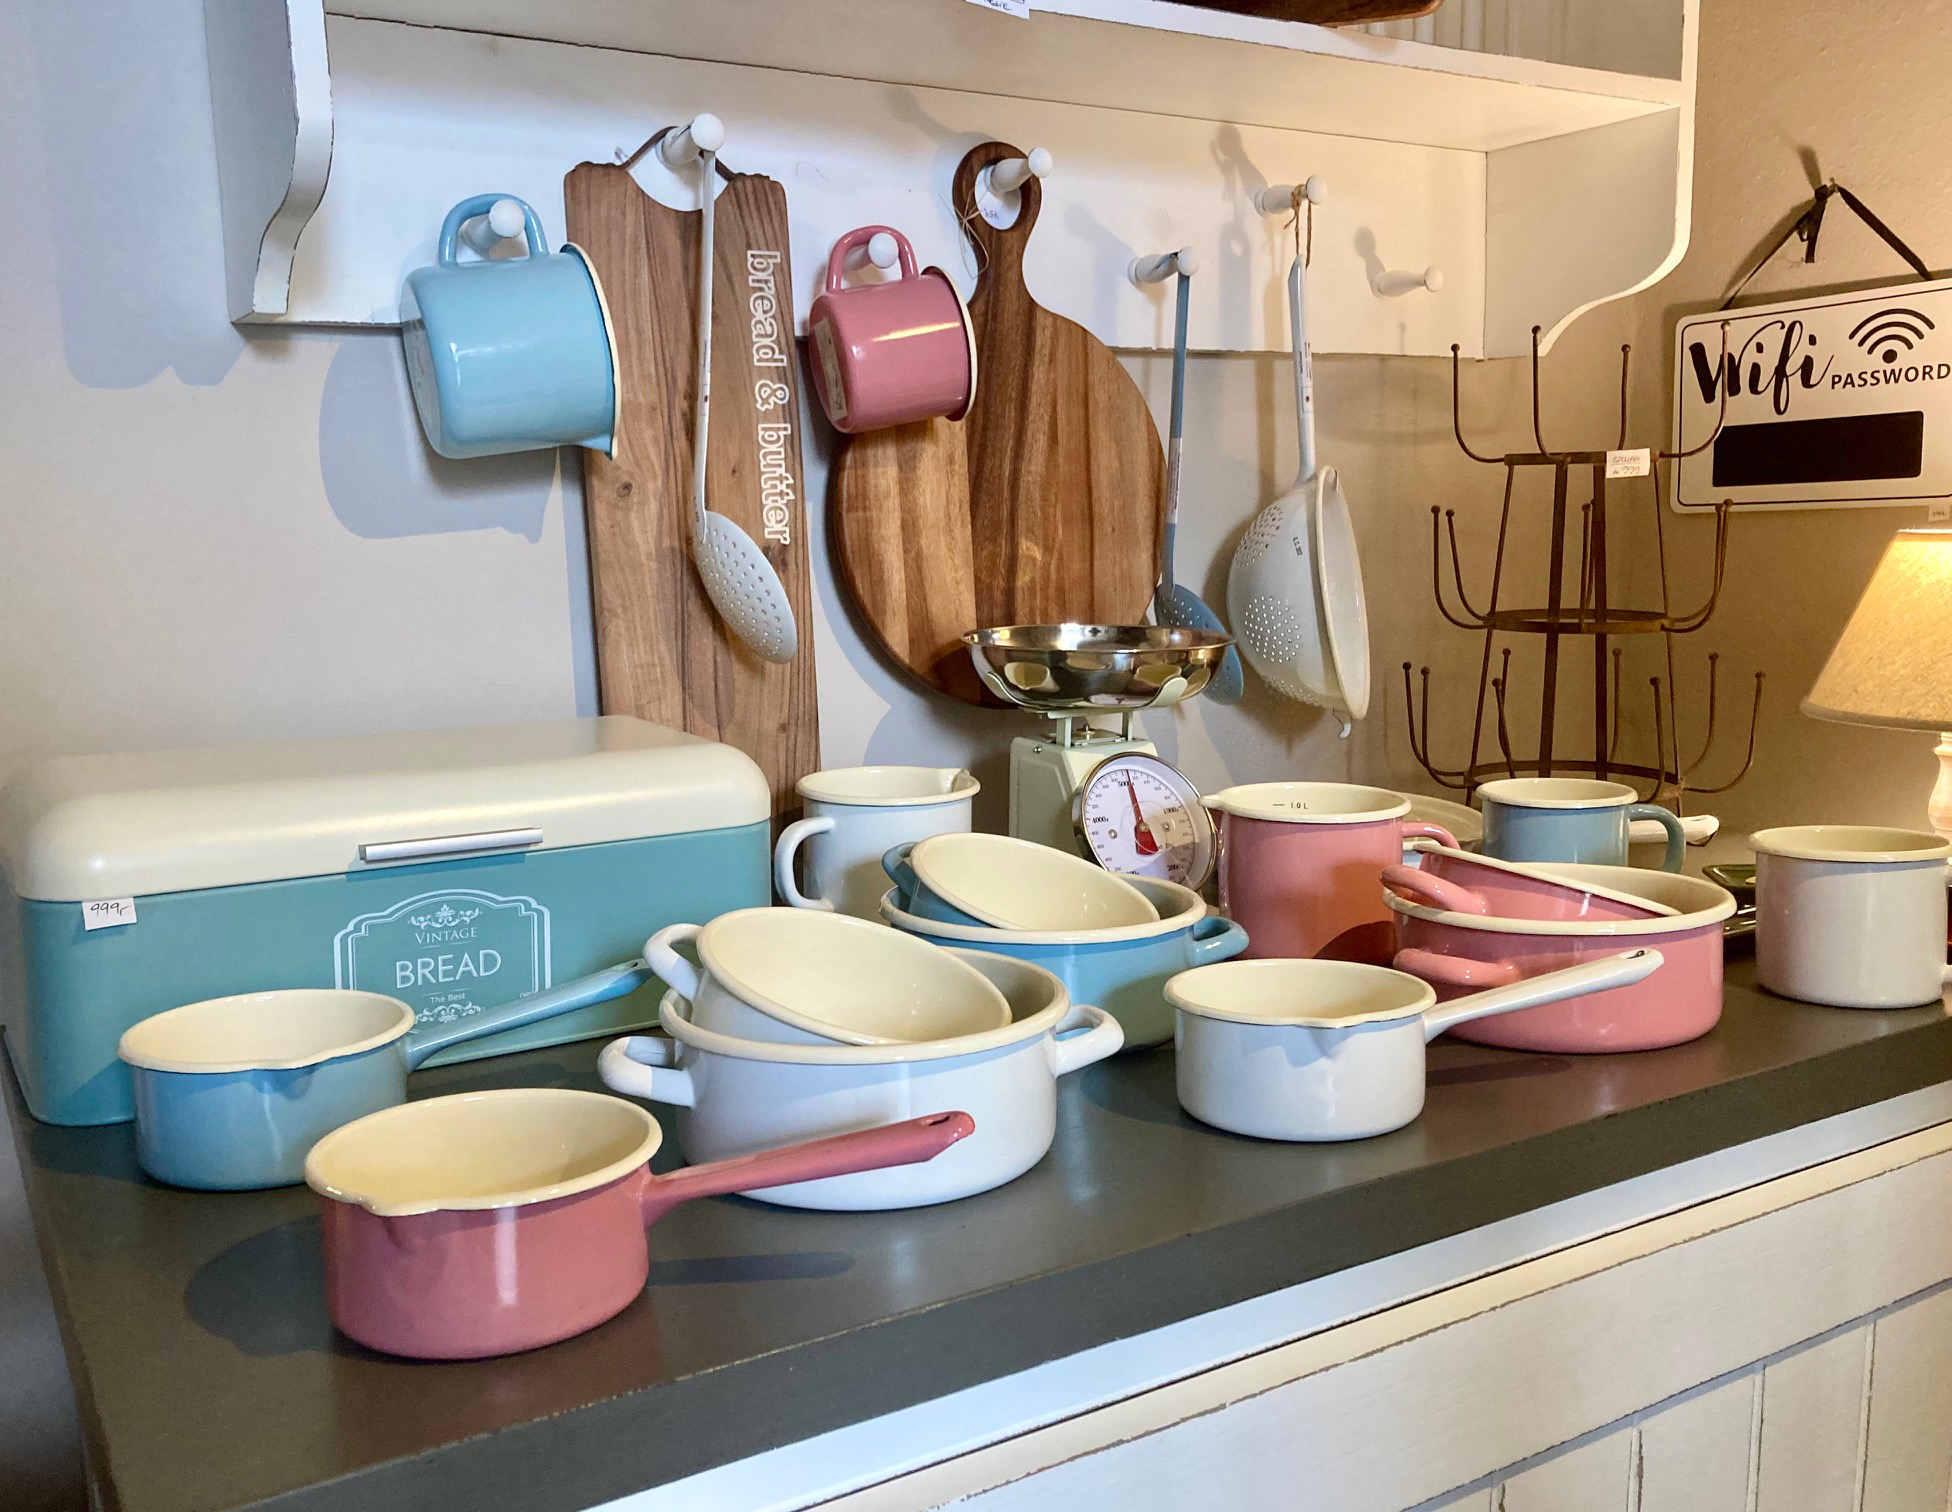 Smaltové nádobí